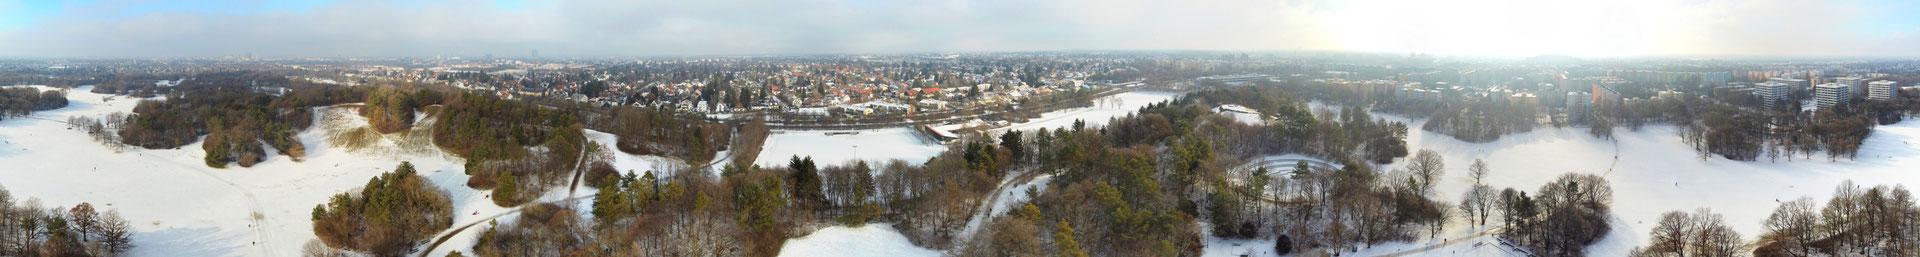 Panorama - München - Ostpark - Perlach - Winter - Drohne - Drohnenfoto